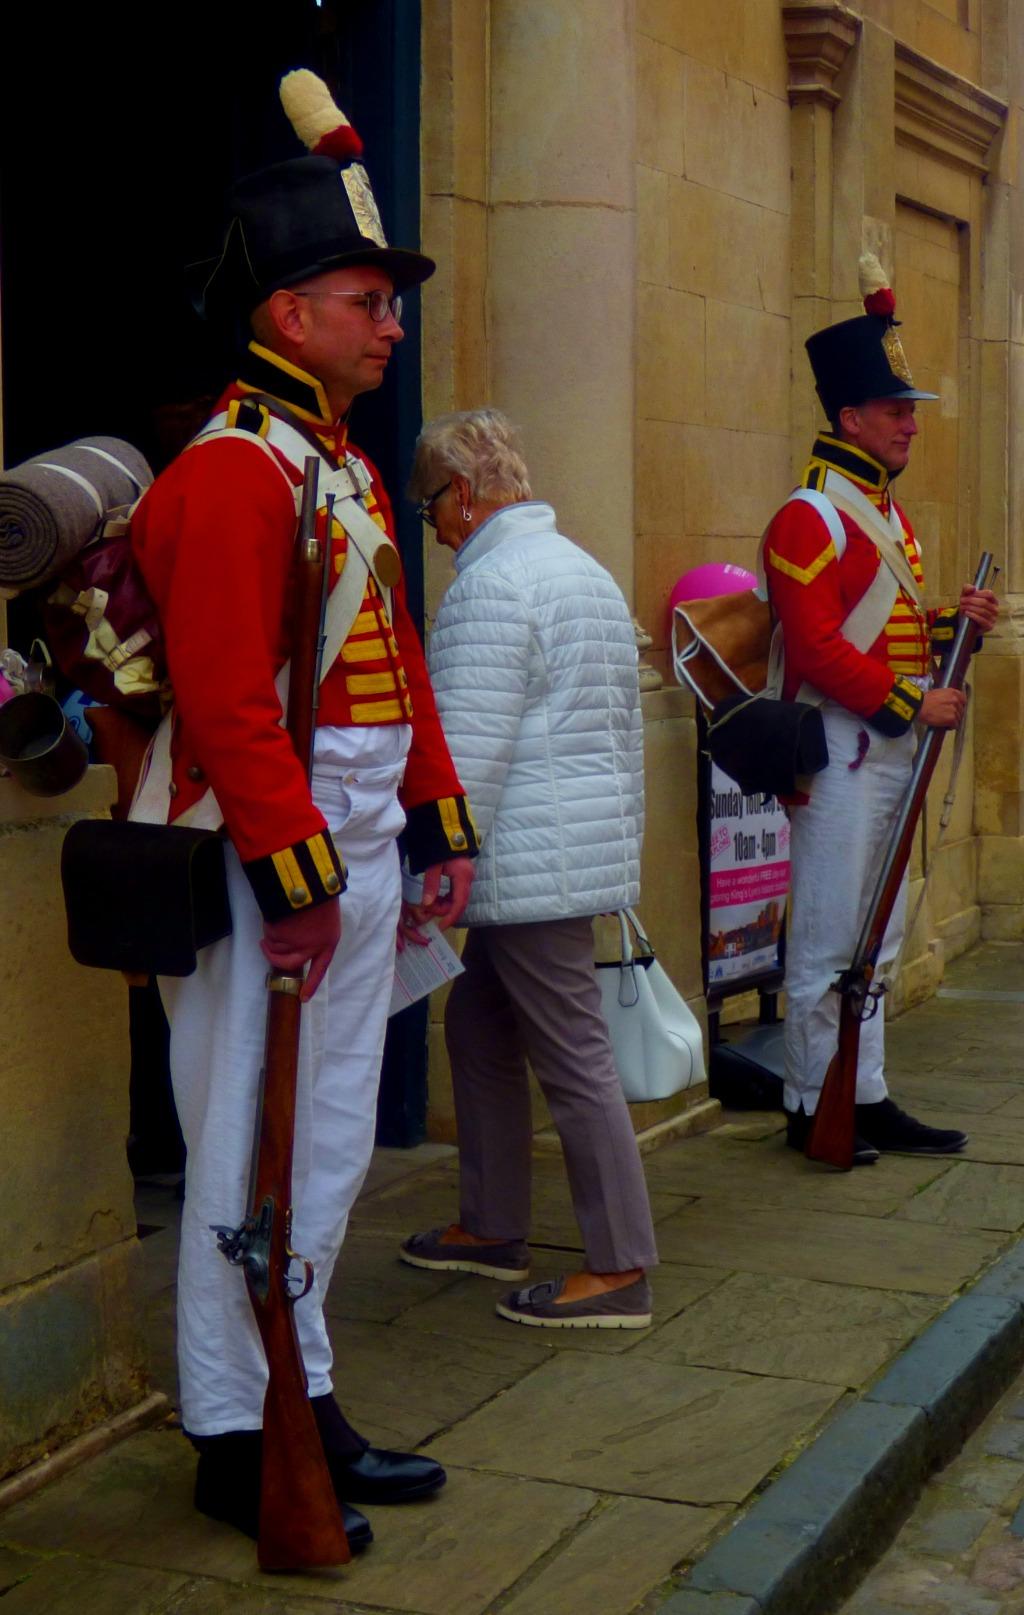 Guarding Custom House